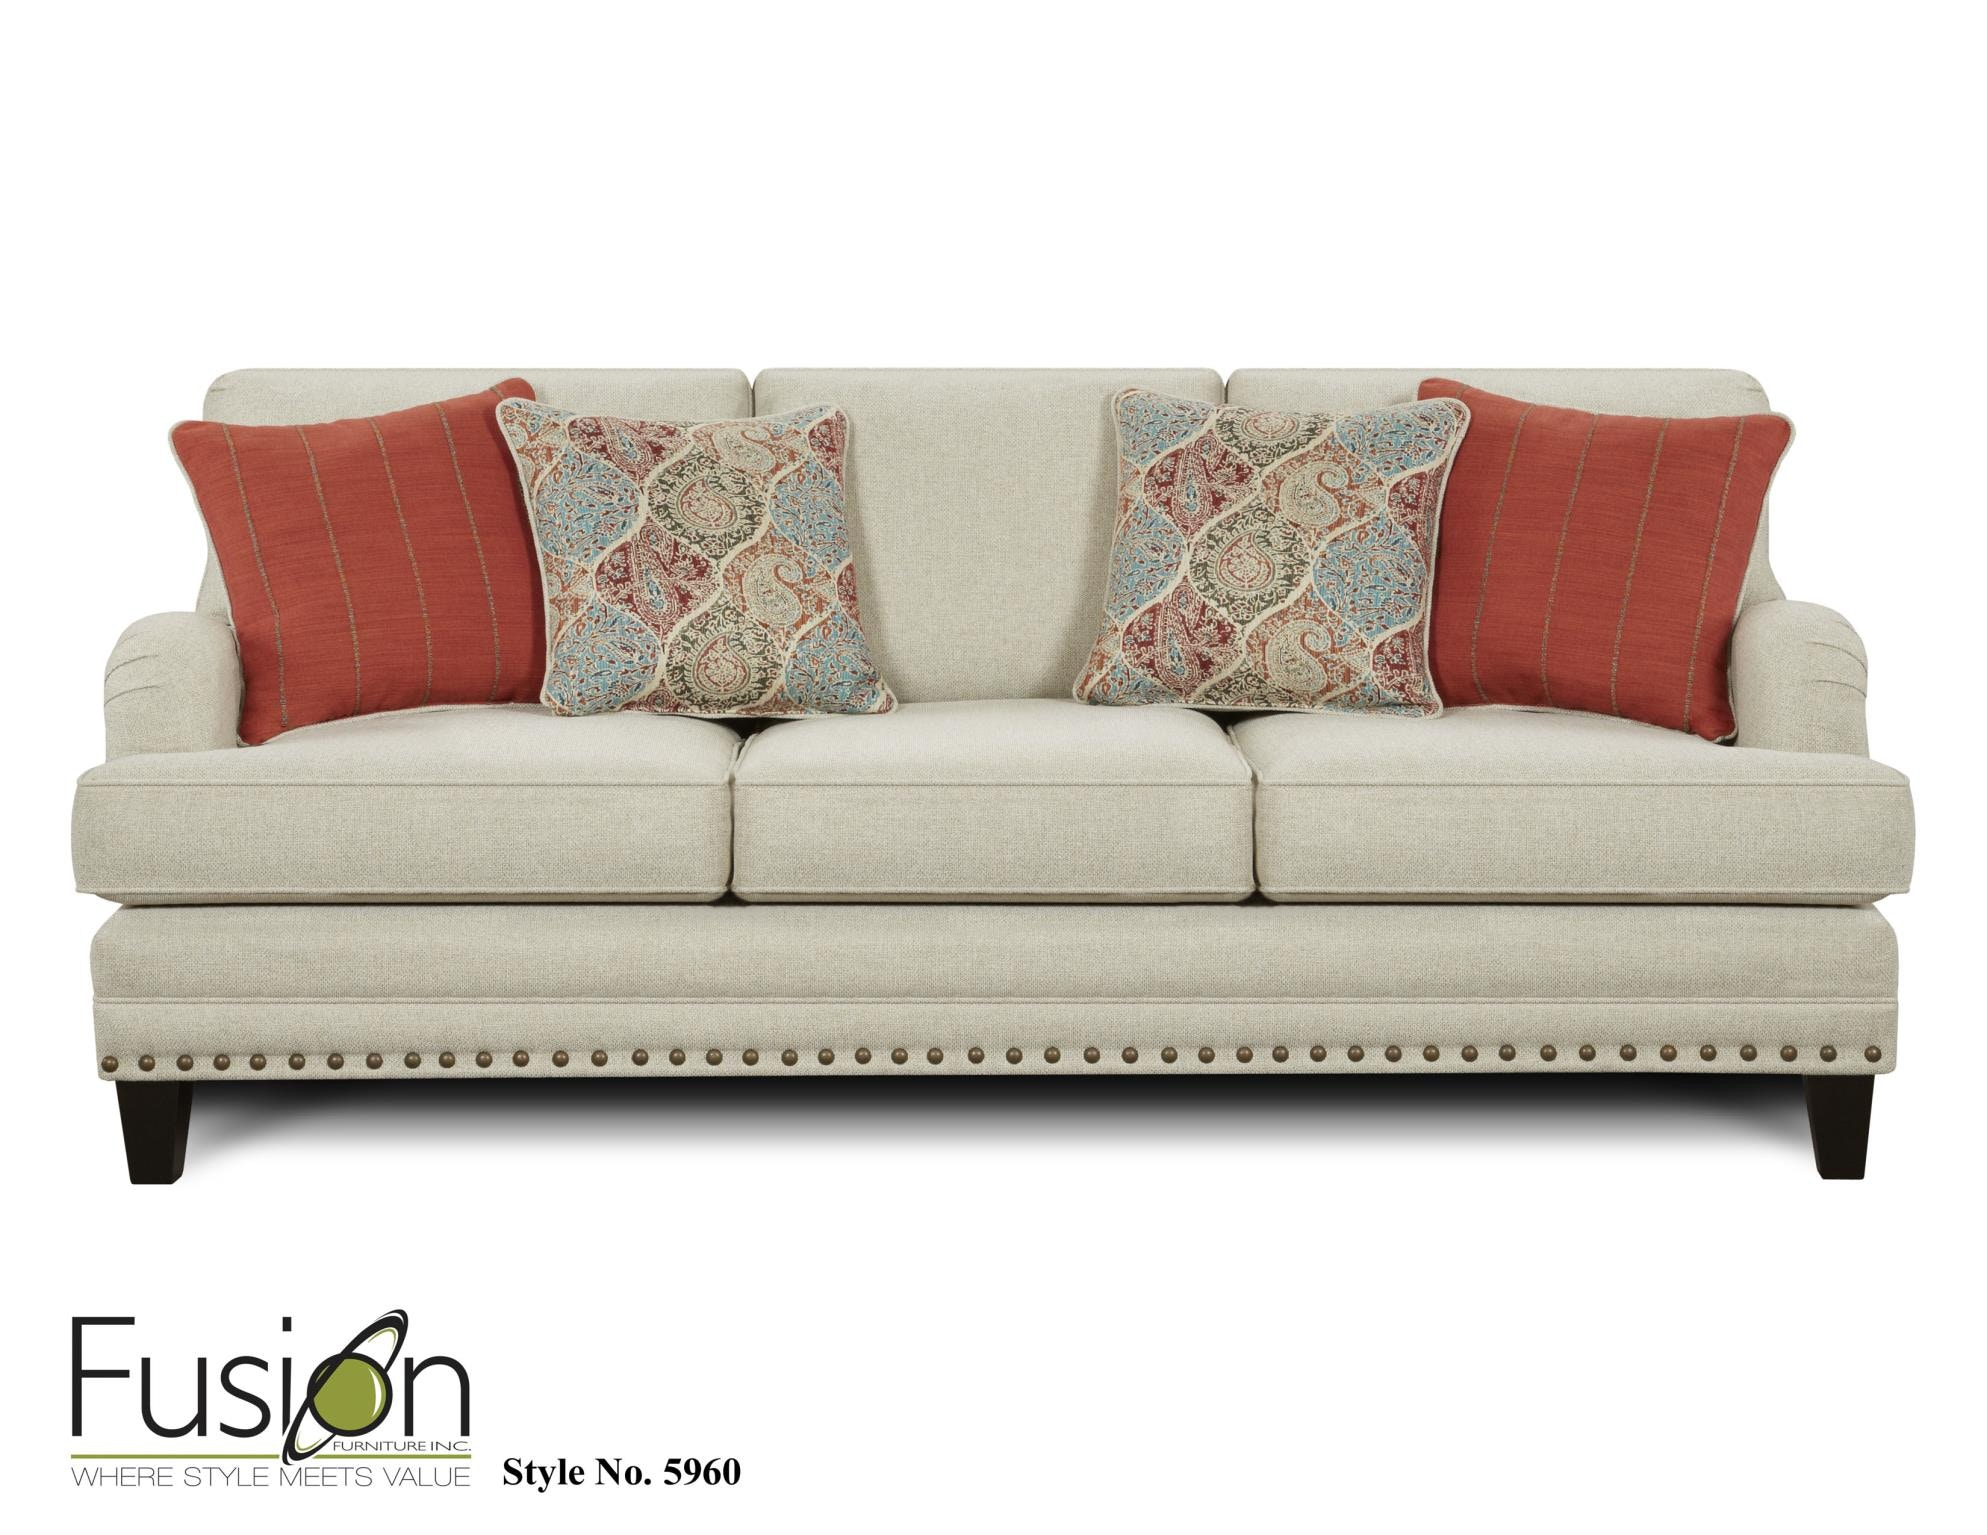 Fusion Living Room Sofa 5960ARIA LINEN At Priba Furniture And Interiors